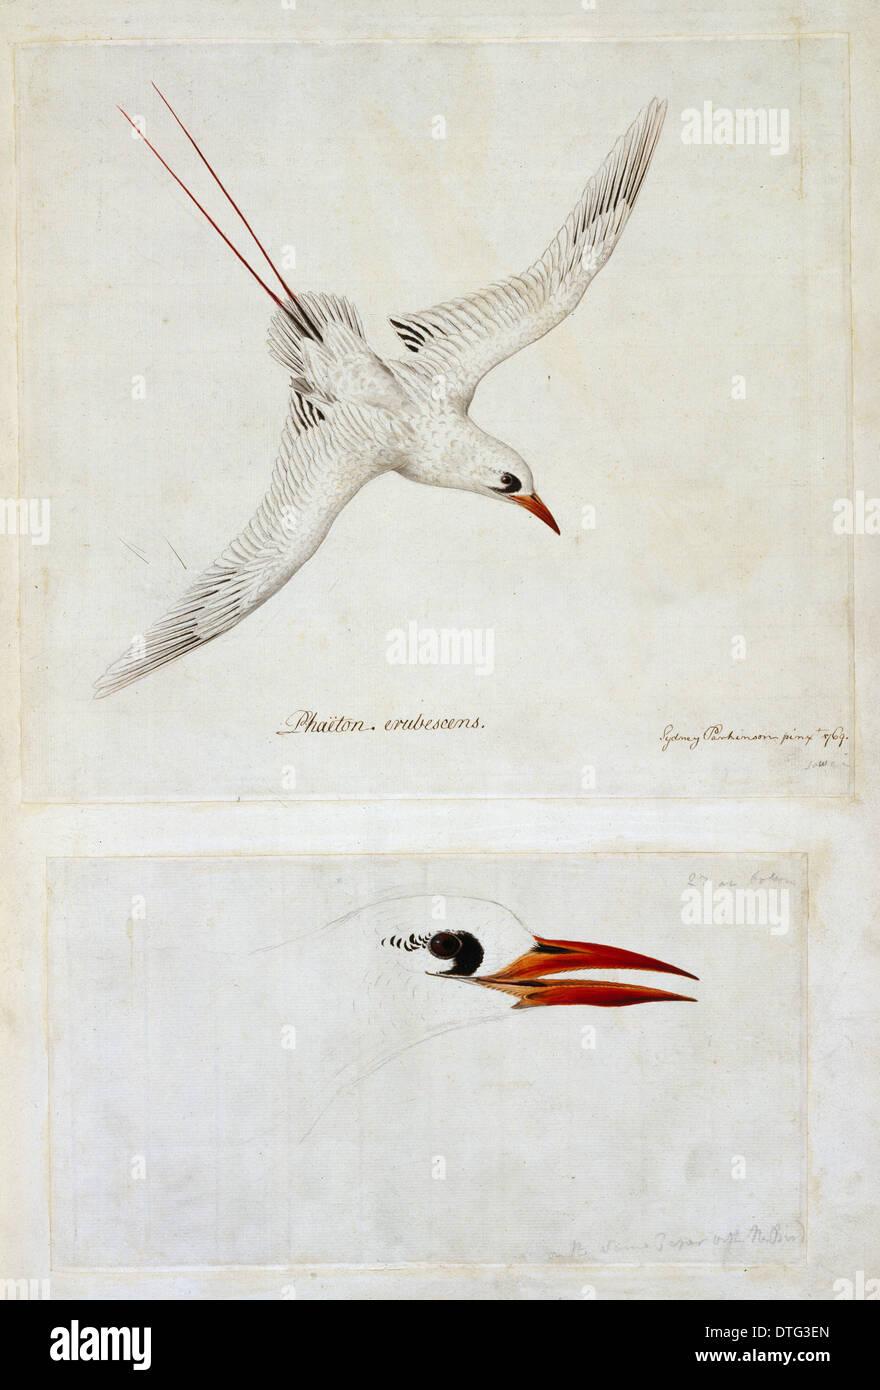 Phaethon rubricauda, red-tailed tropicbirdStock Photo